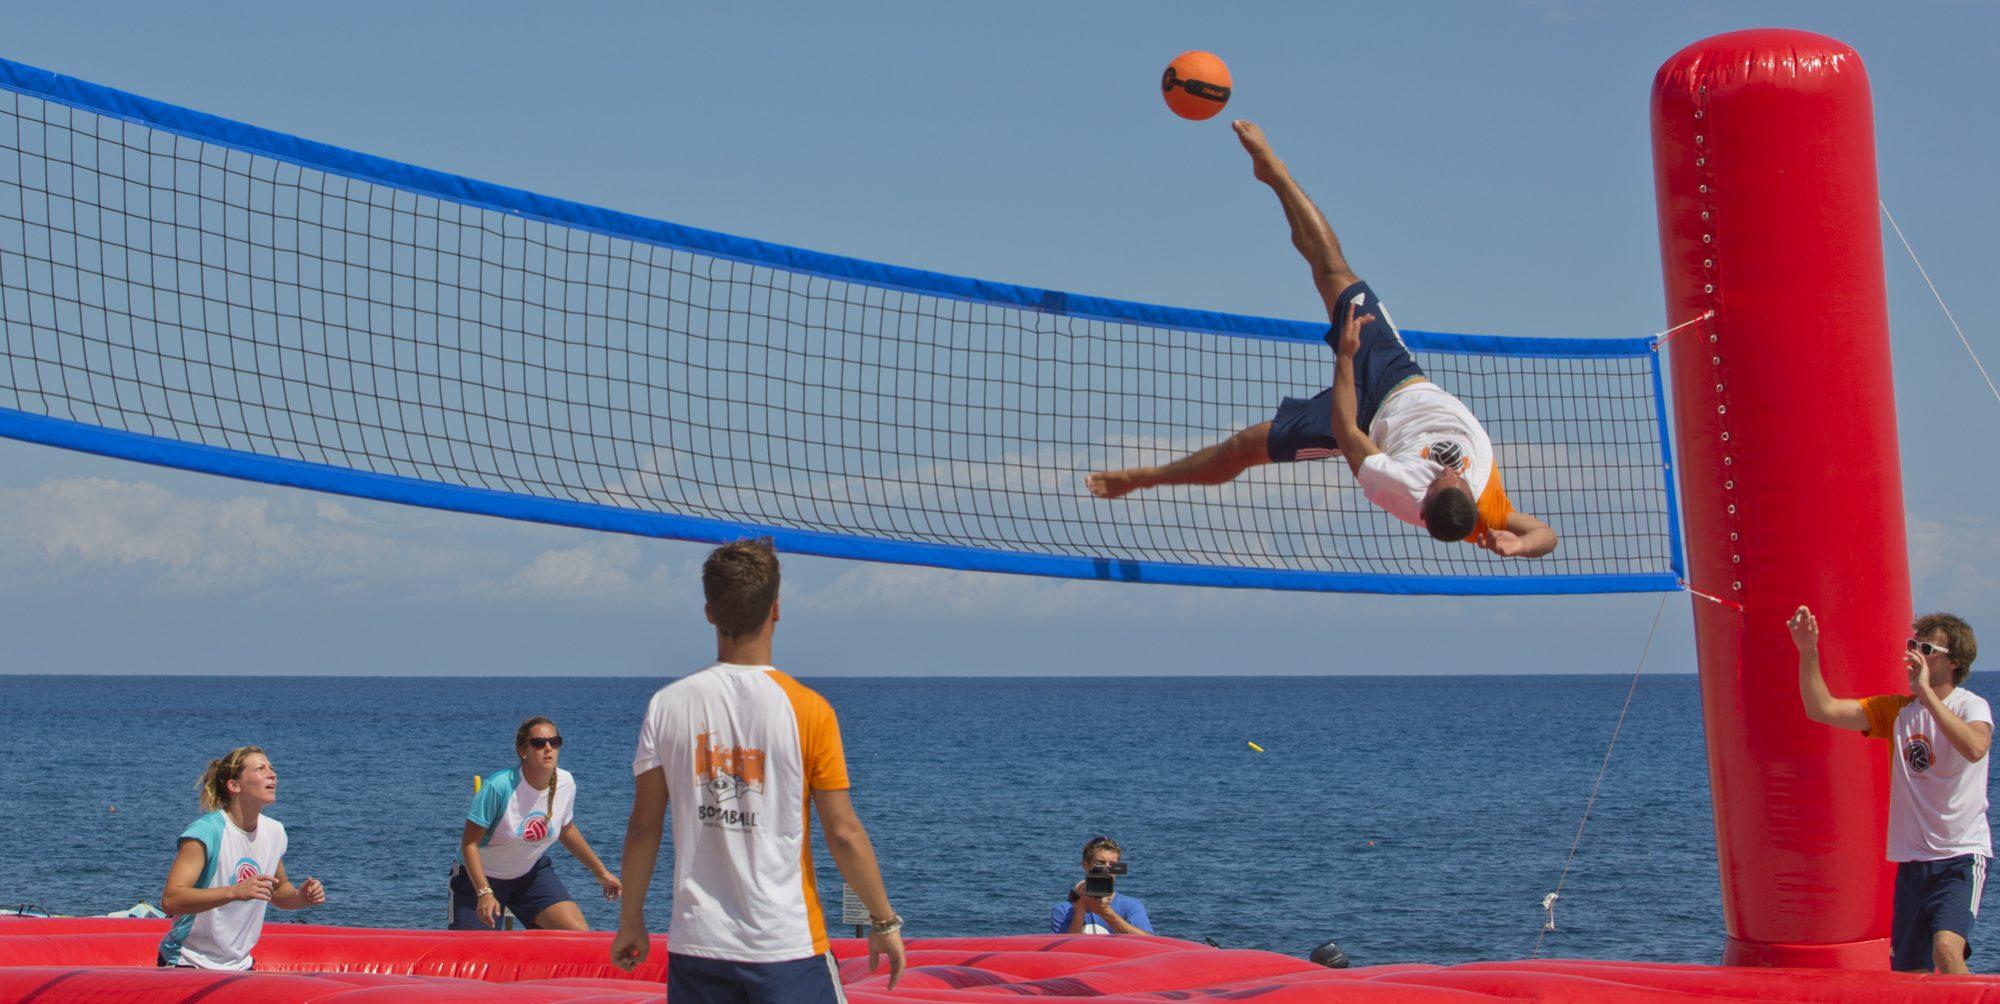 Le bossaball : mix entre trampoline et beach-volley !